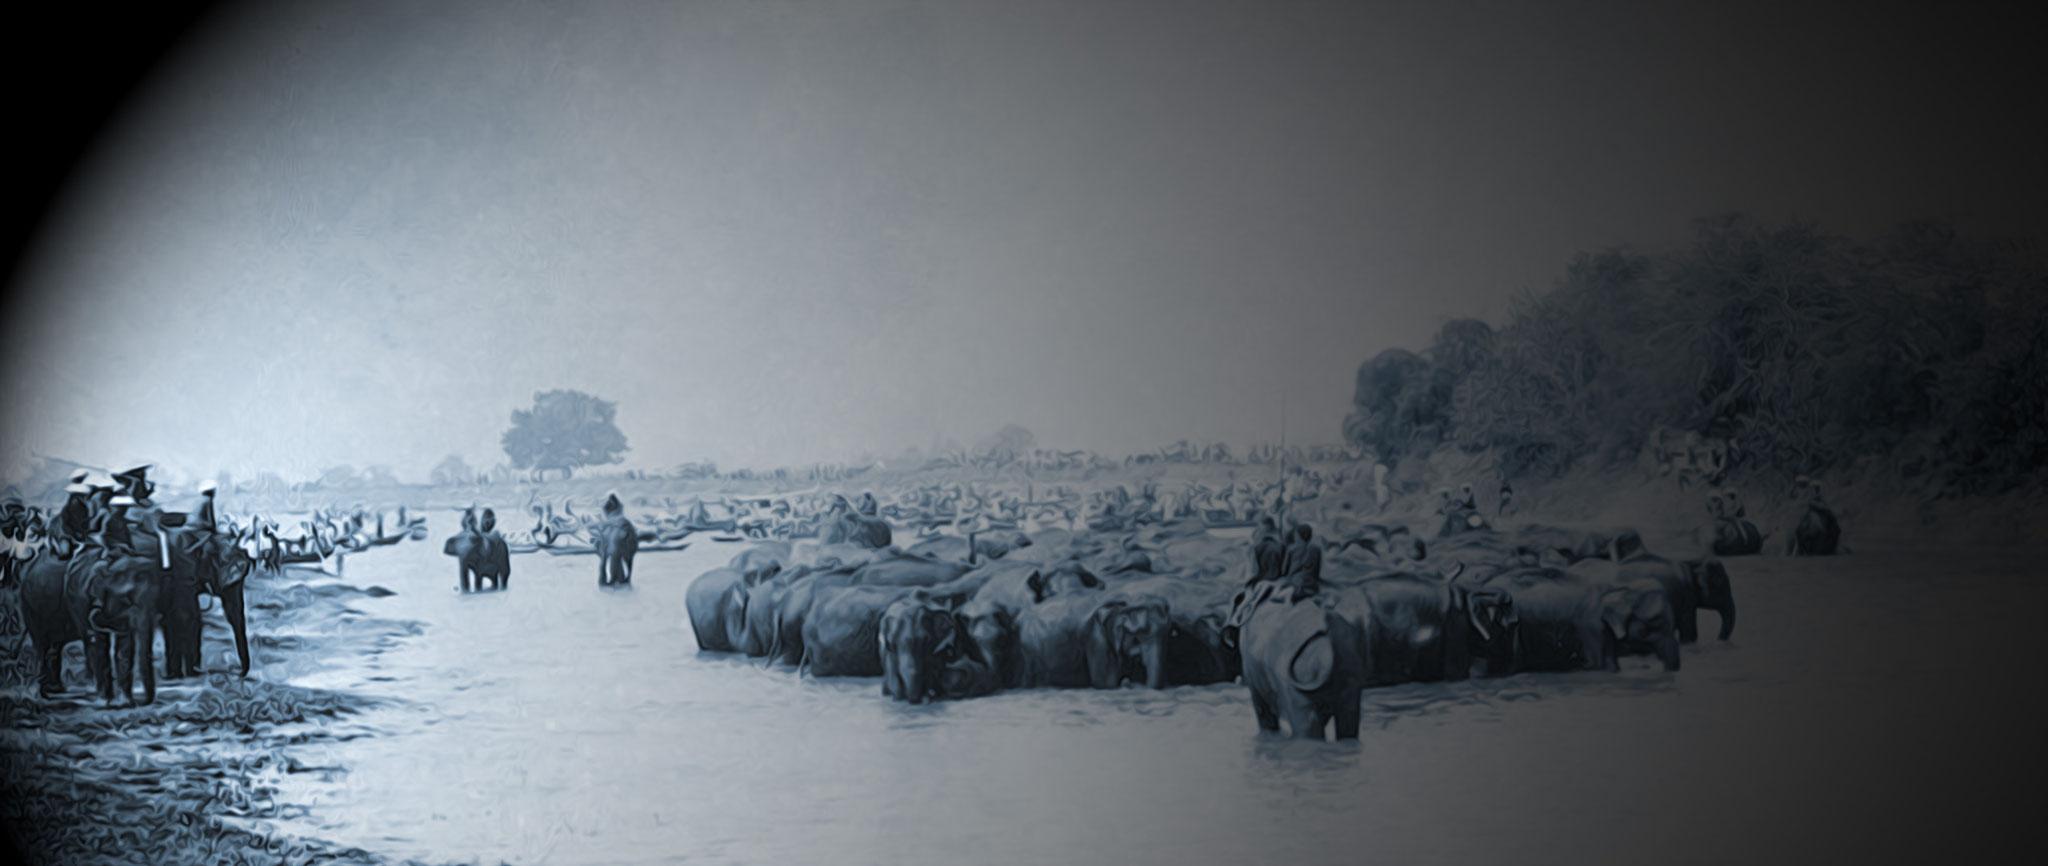 Herding elephants at rangsit canal